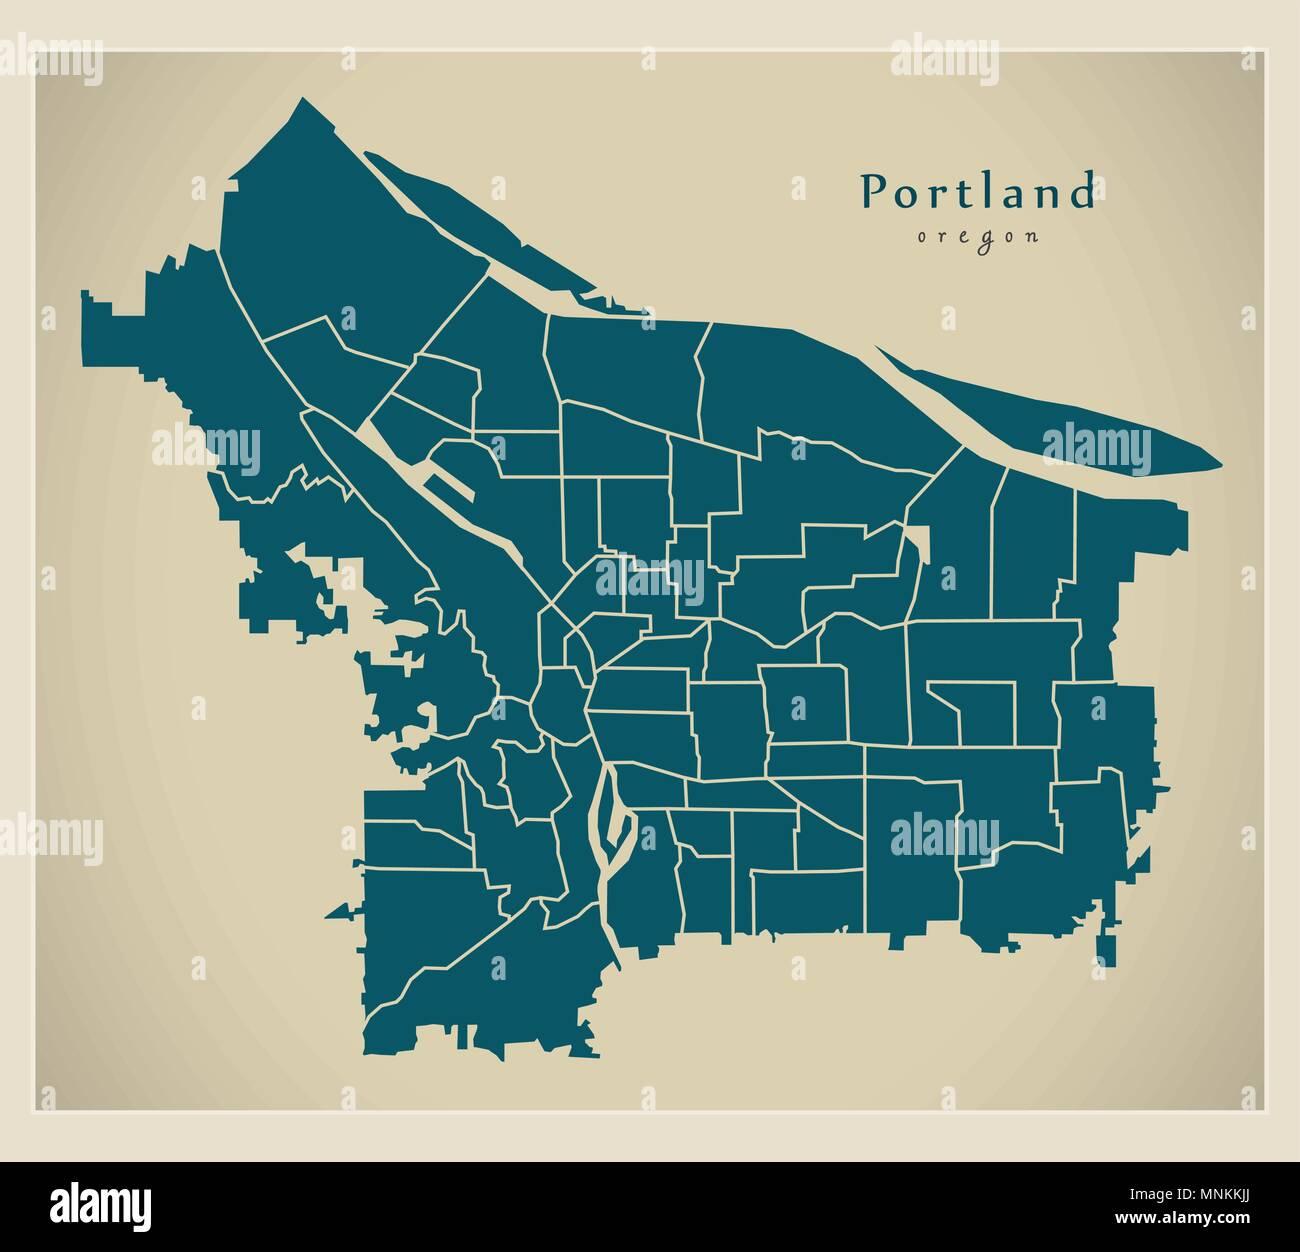 Portland Neighborhoods By The Numbers 2018 The City